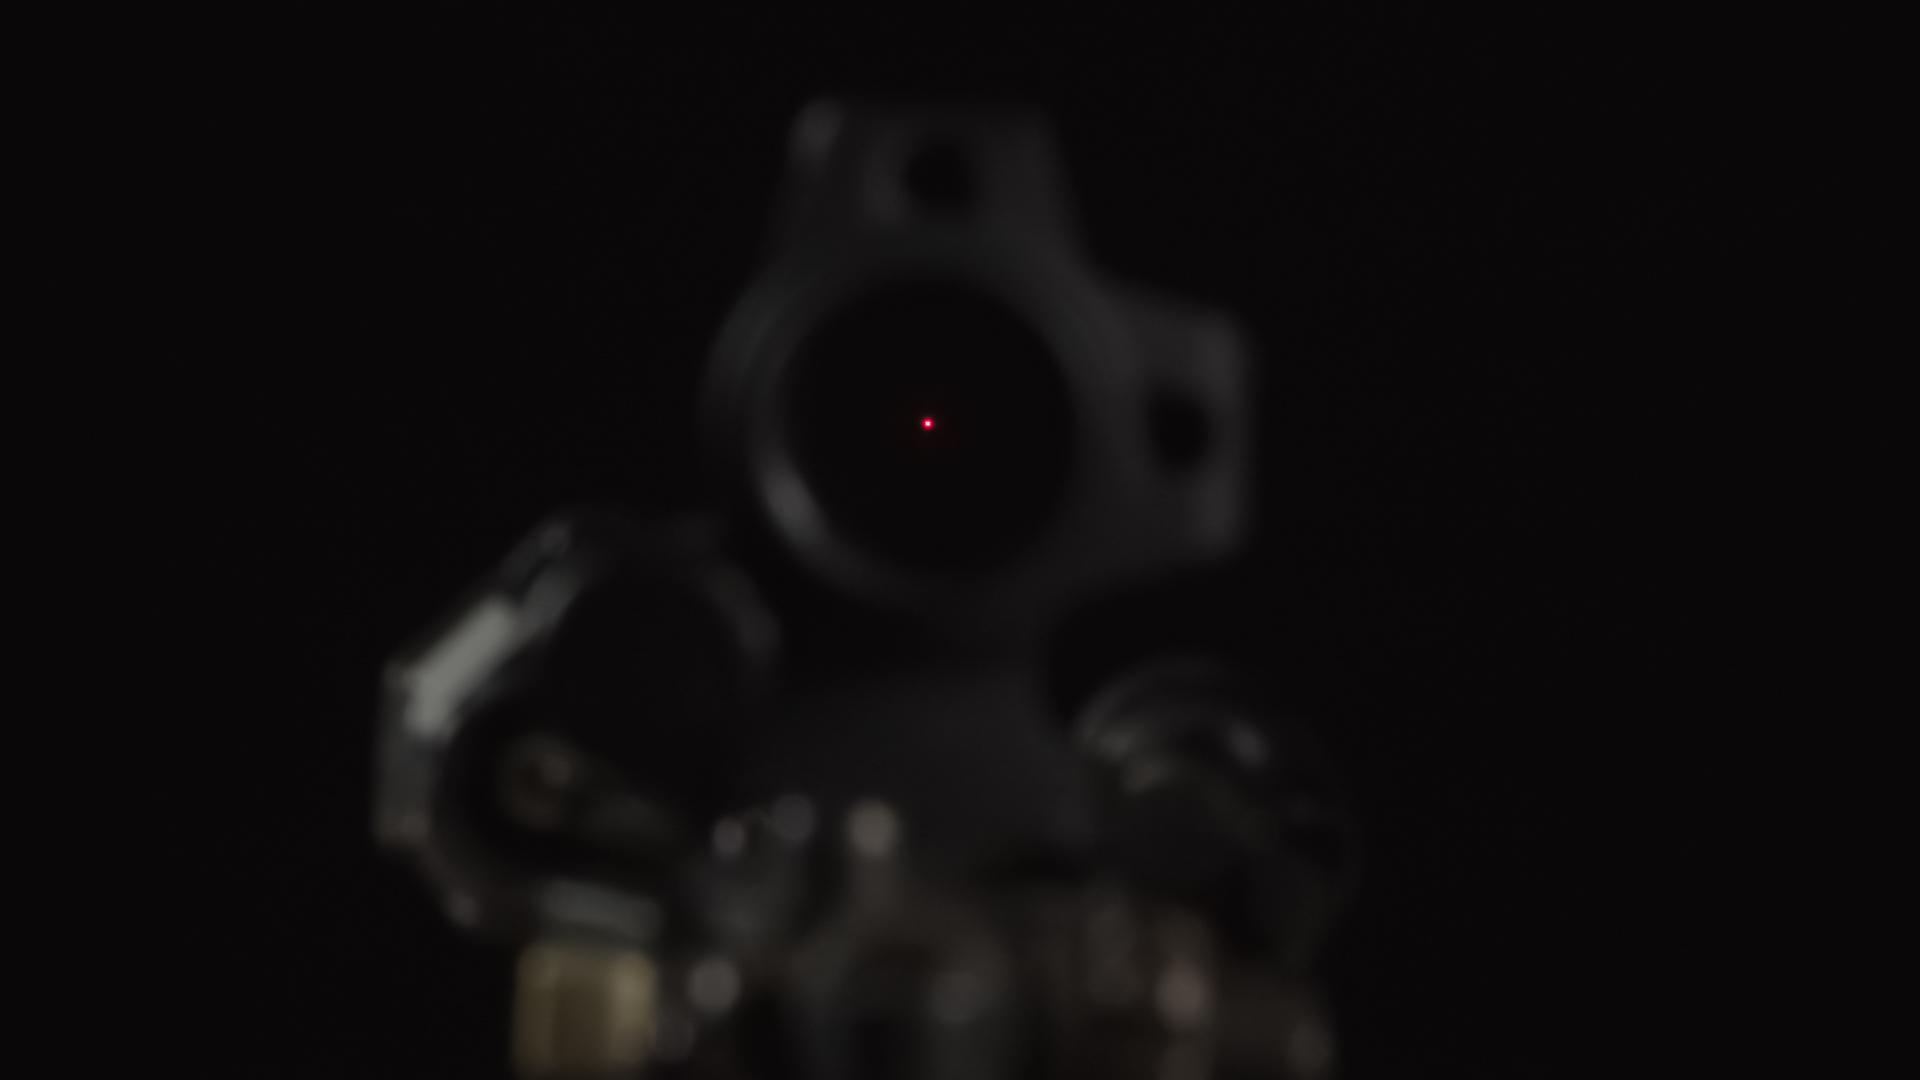 Reflex Red Dot in the Dark Room